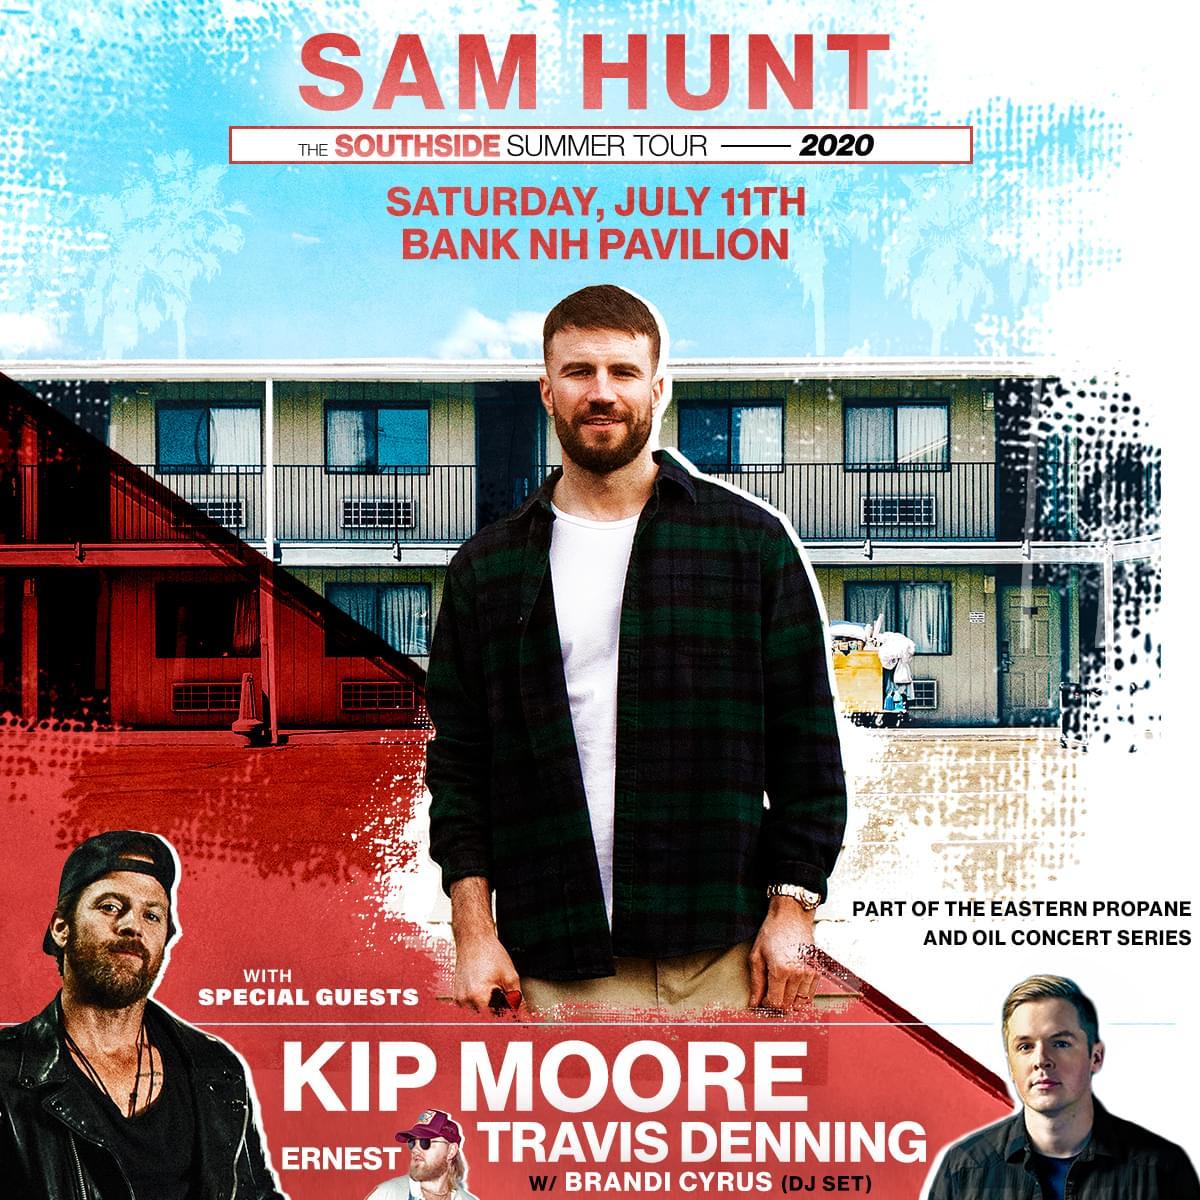 Sam Hunt at Bank of New Hampshire Pavilion on 7/11/20